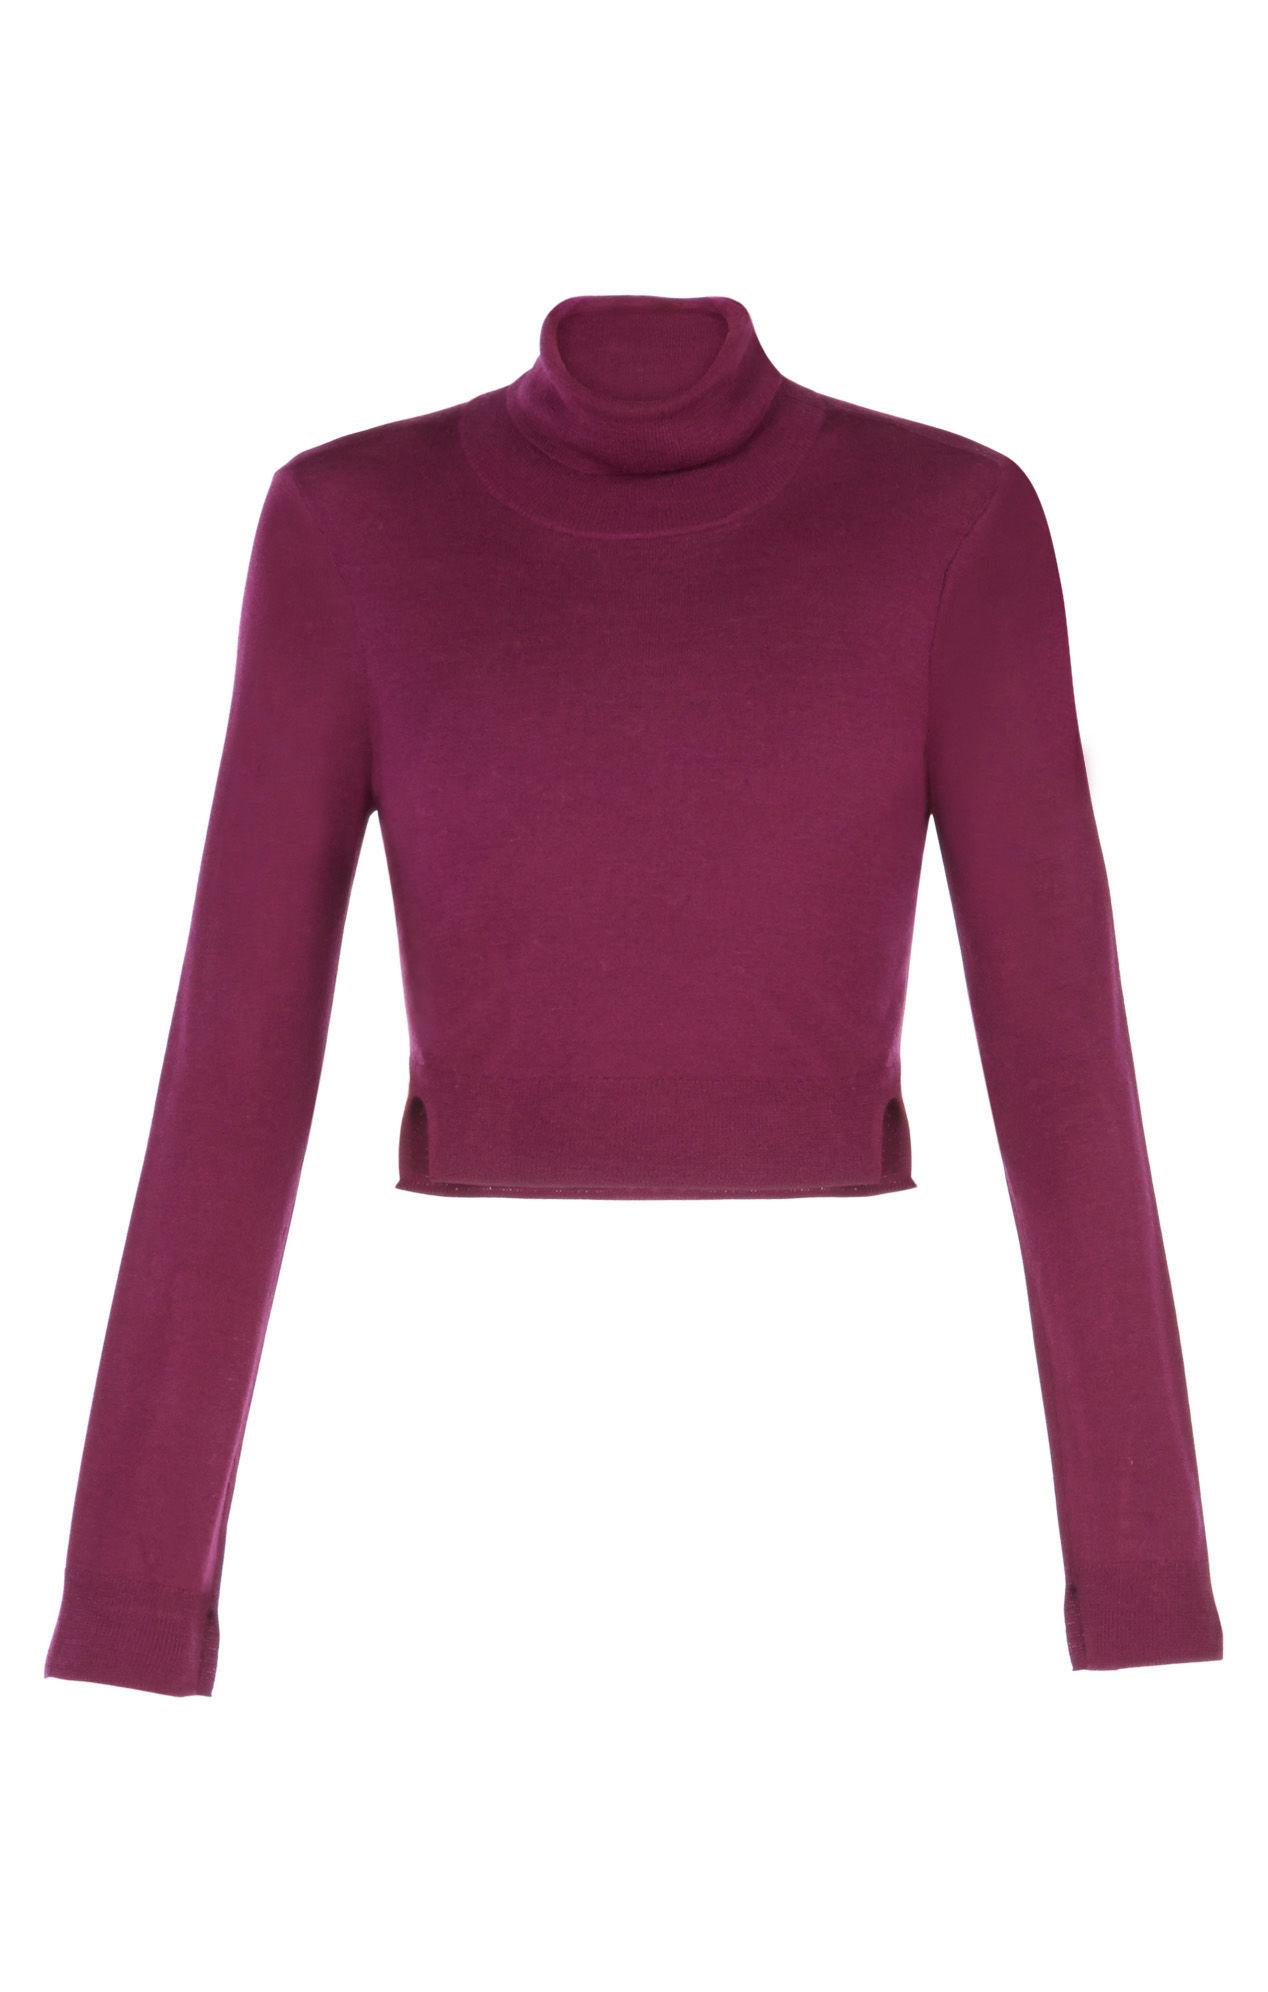 Bcbgmaxazria Natassia Cropped Turtleneck Wool Sweater in Purple | Lyst